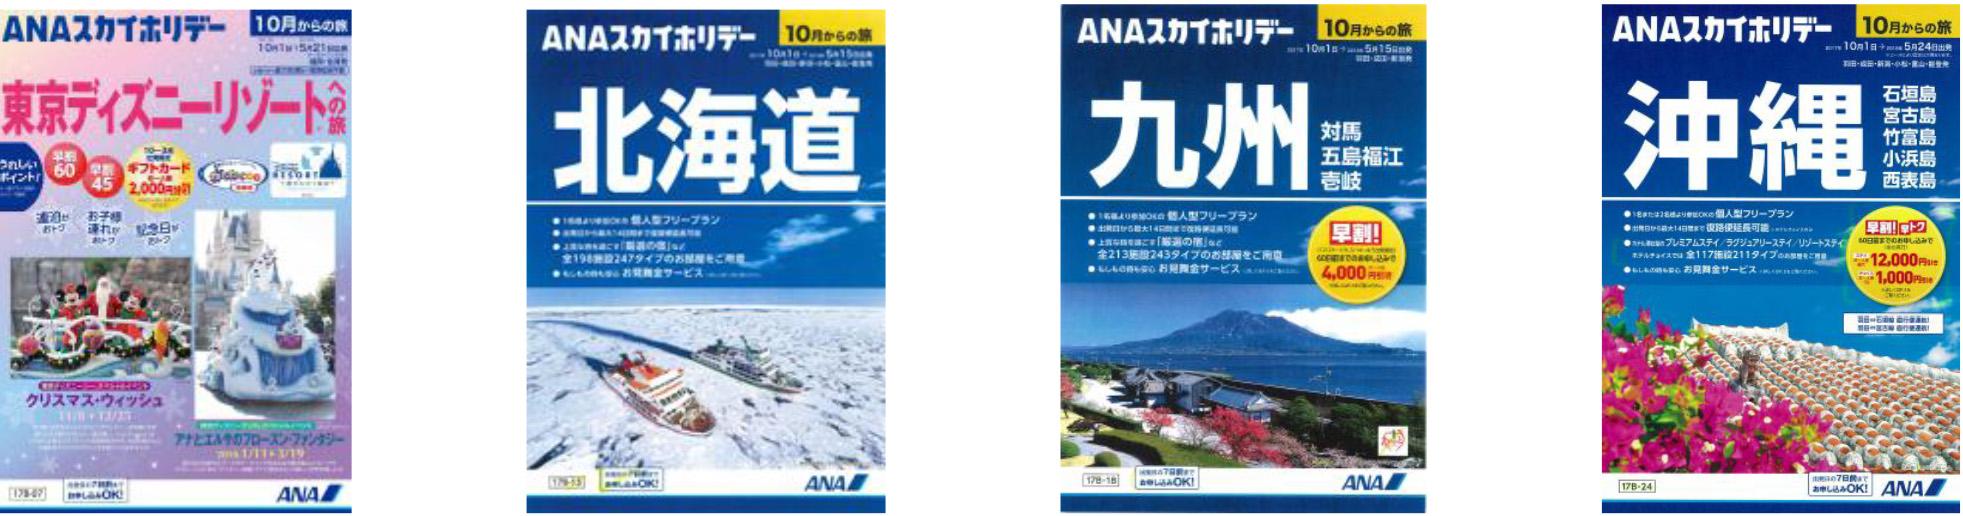 ANAセールスは2017年度下期の旅行商品を発表